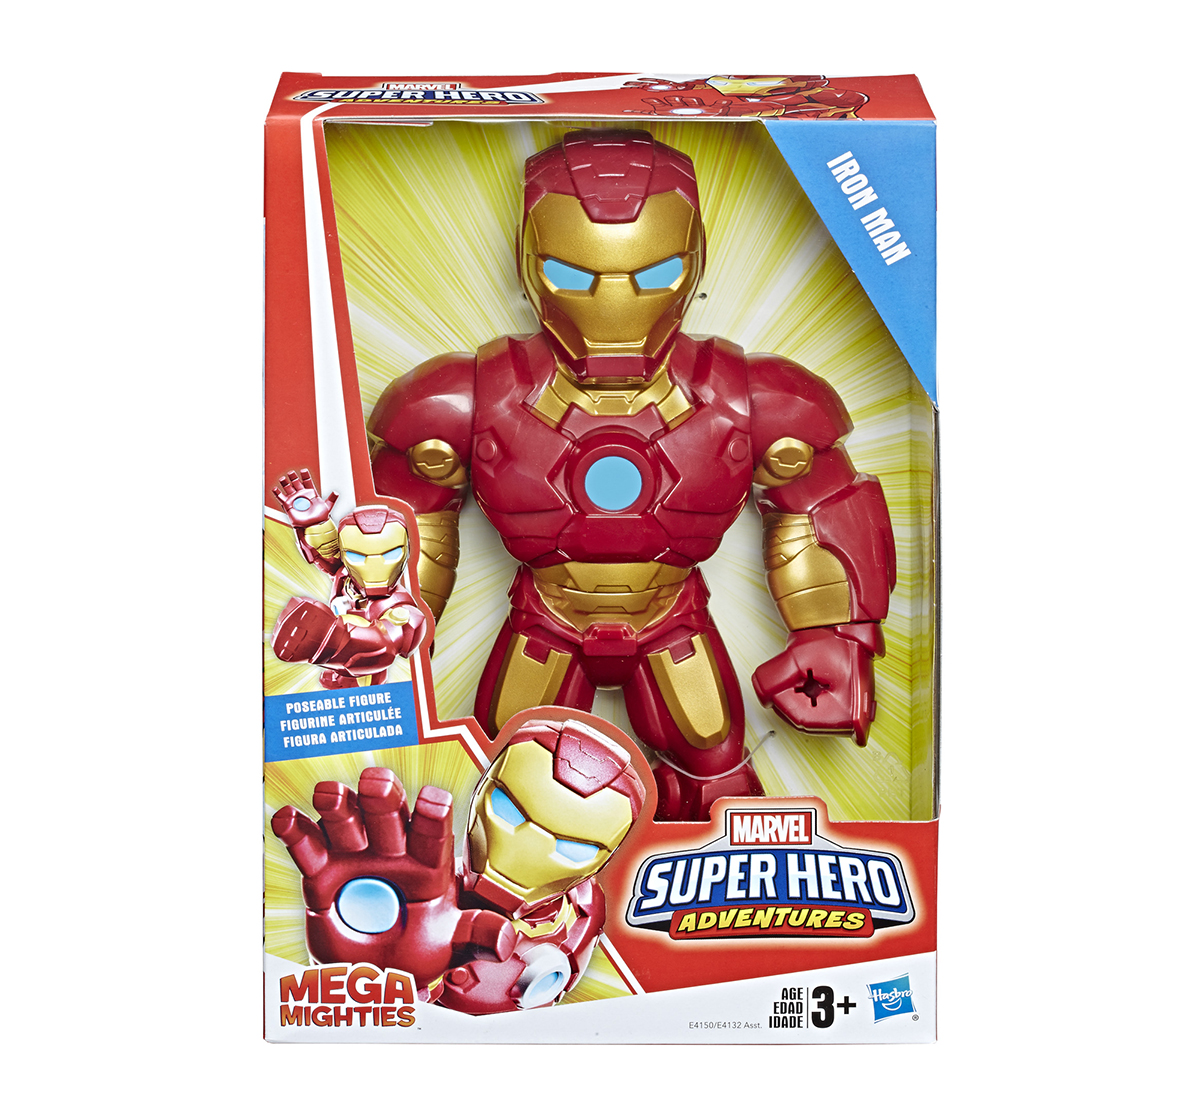 Mega Mighties | Marvel Super Hero Adventure Mega Mighties Iron Man Activity Toys for Boys age 3Y+